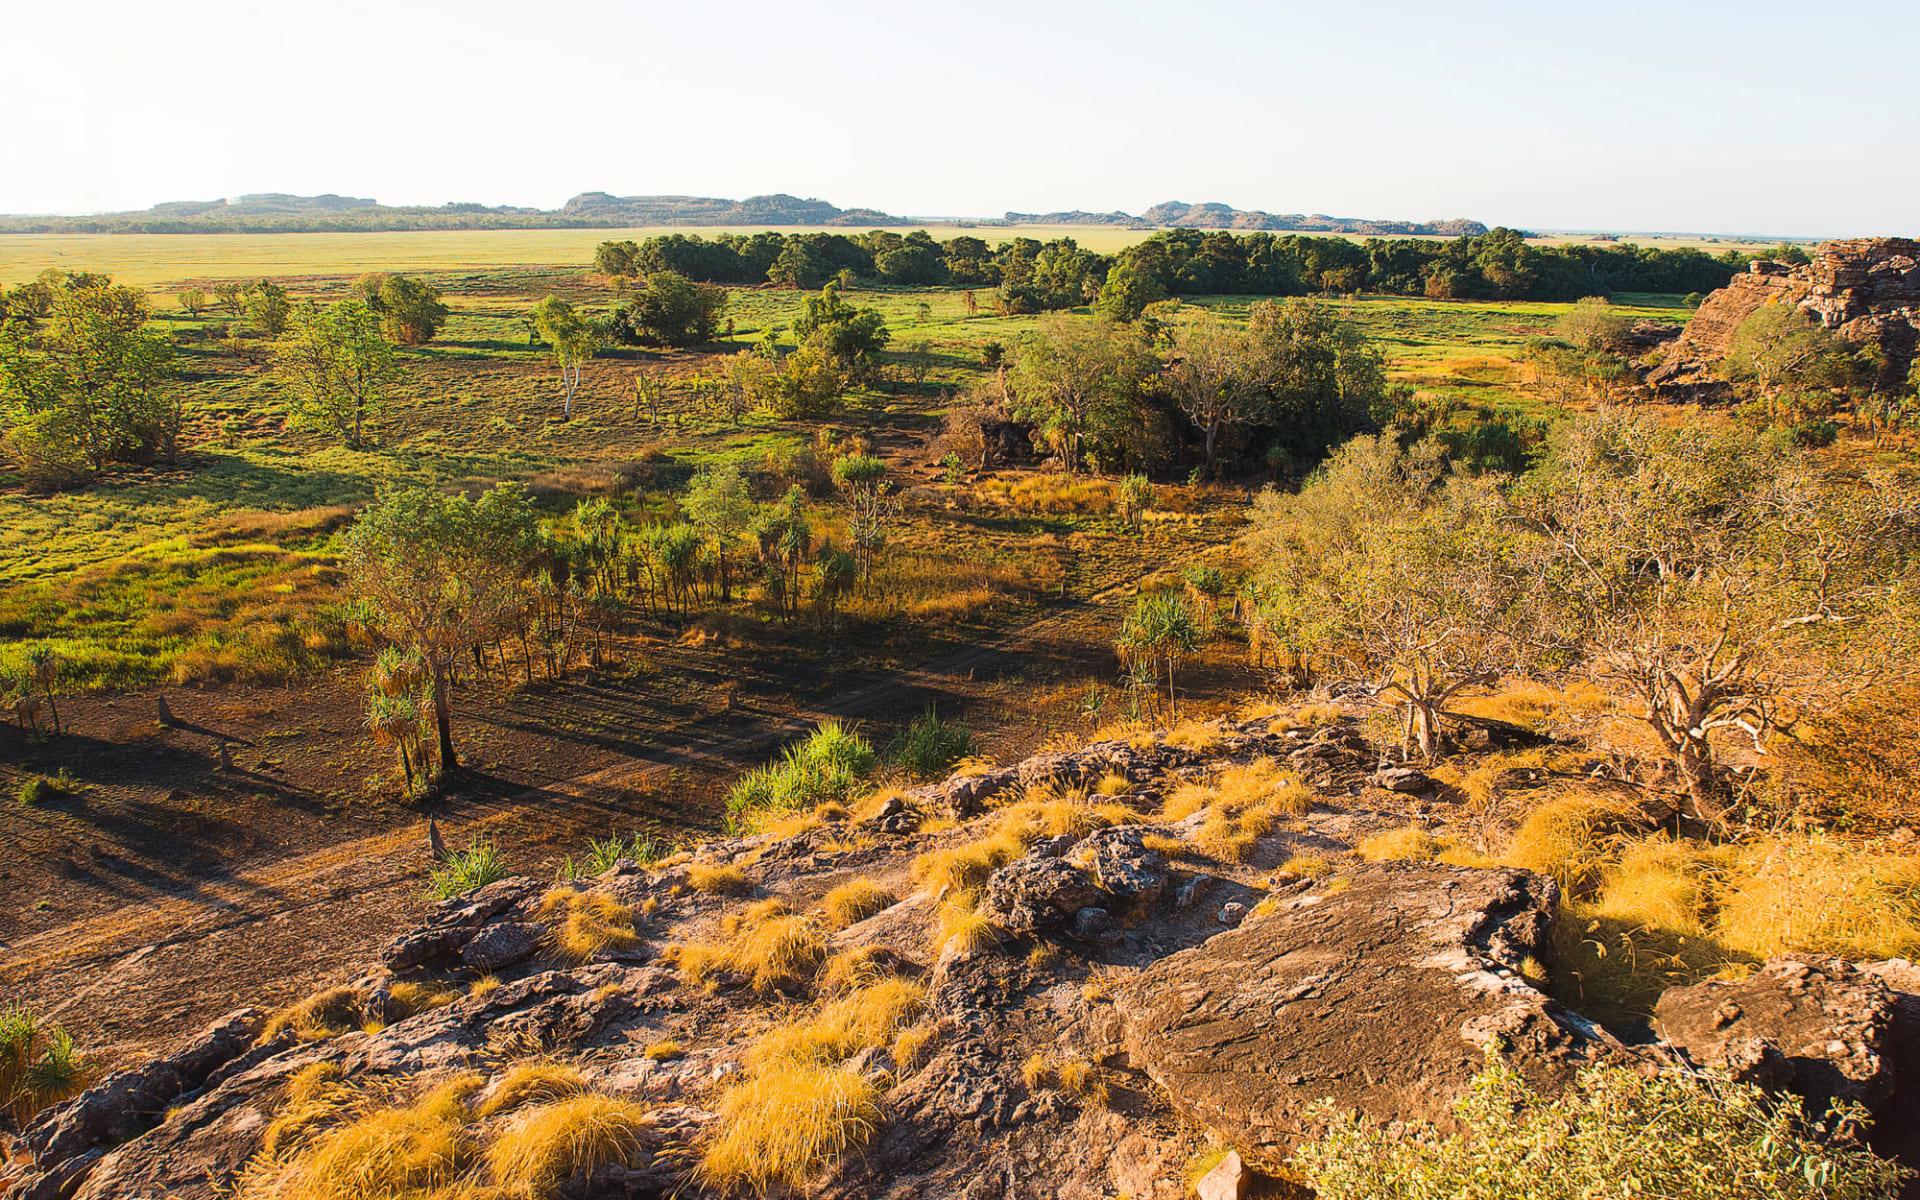 Wildman Wilderness Lodge in Mary River: Natur Kakadu Nationalpark Northern Territory Australien  Mary River Wetlands  c shutterstock_315340151 2017